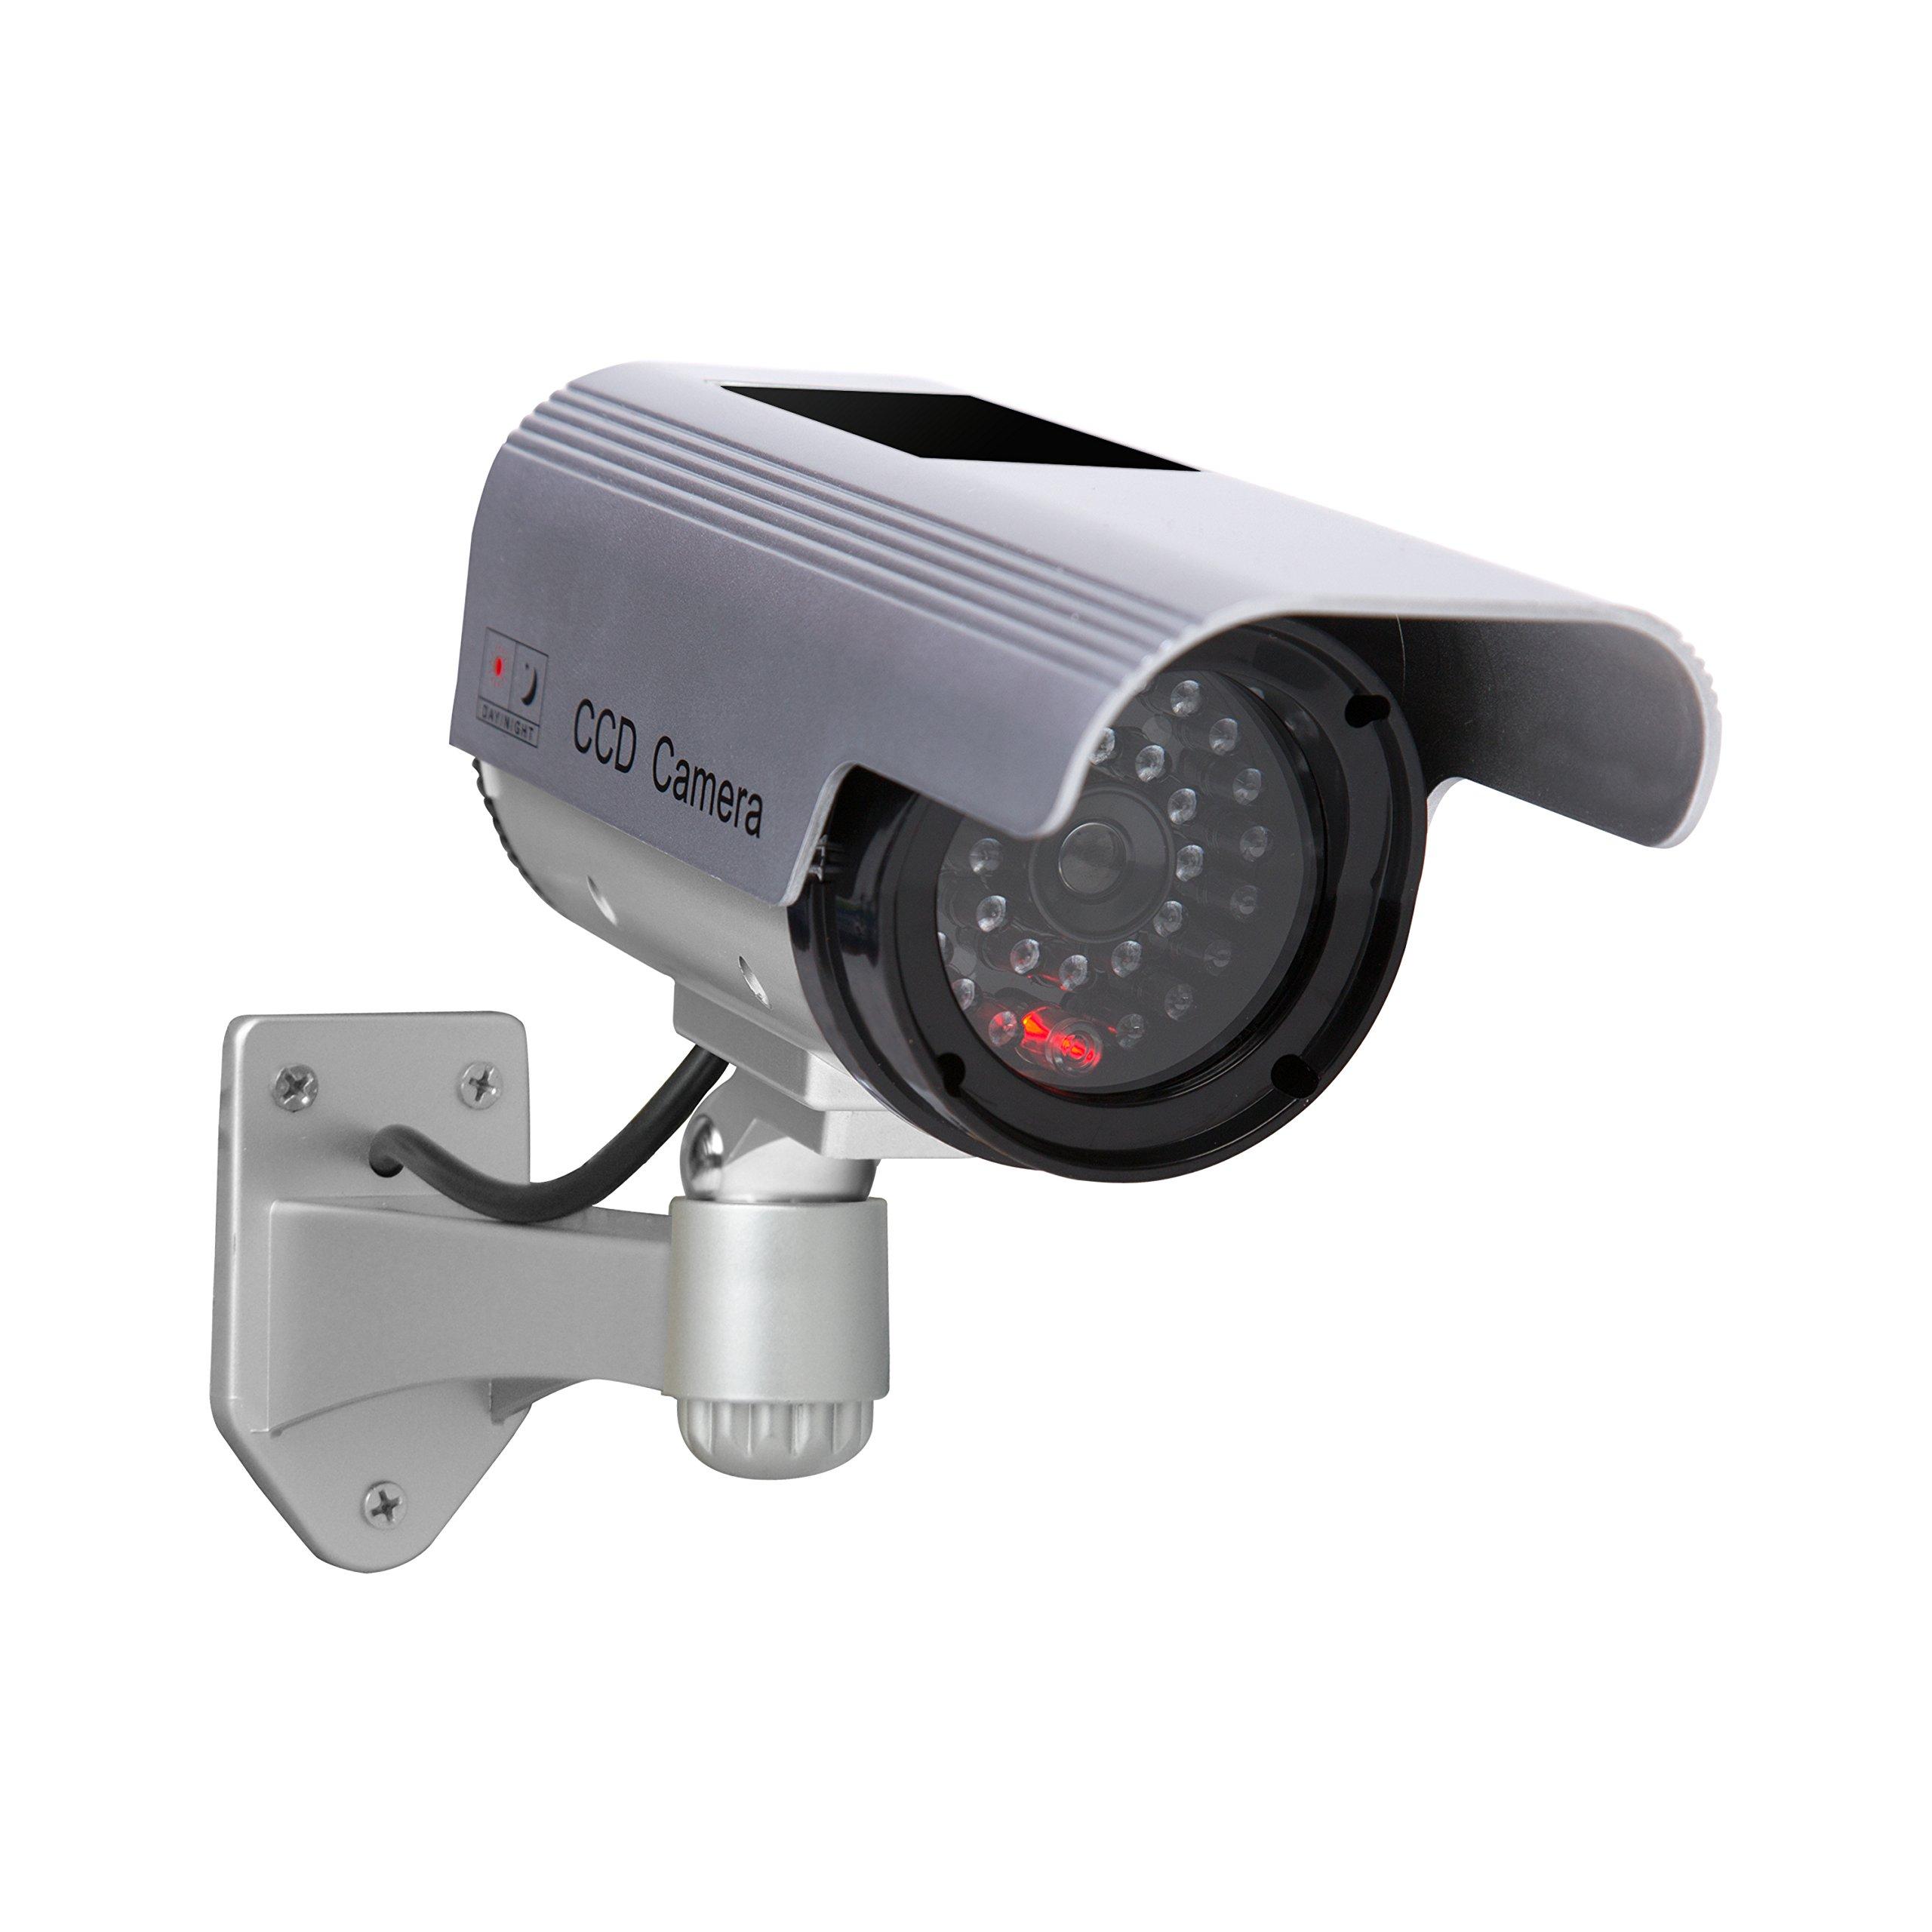 Sunforce 82340 Solar Fake Security Camera with Blinking Light